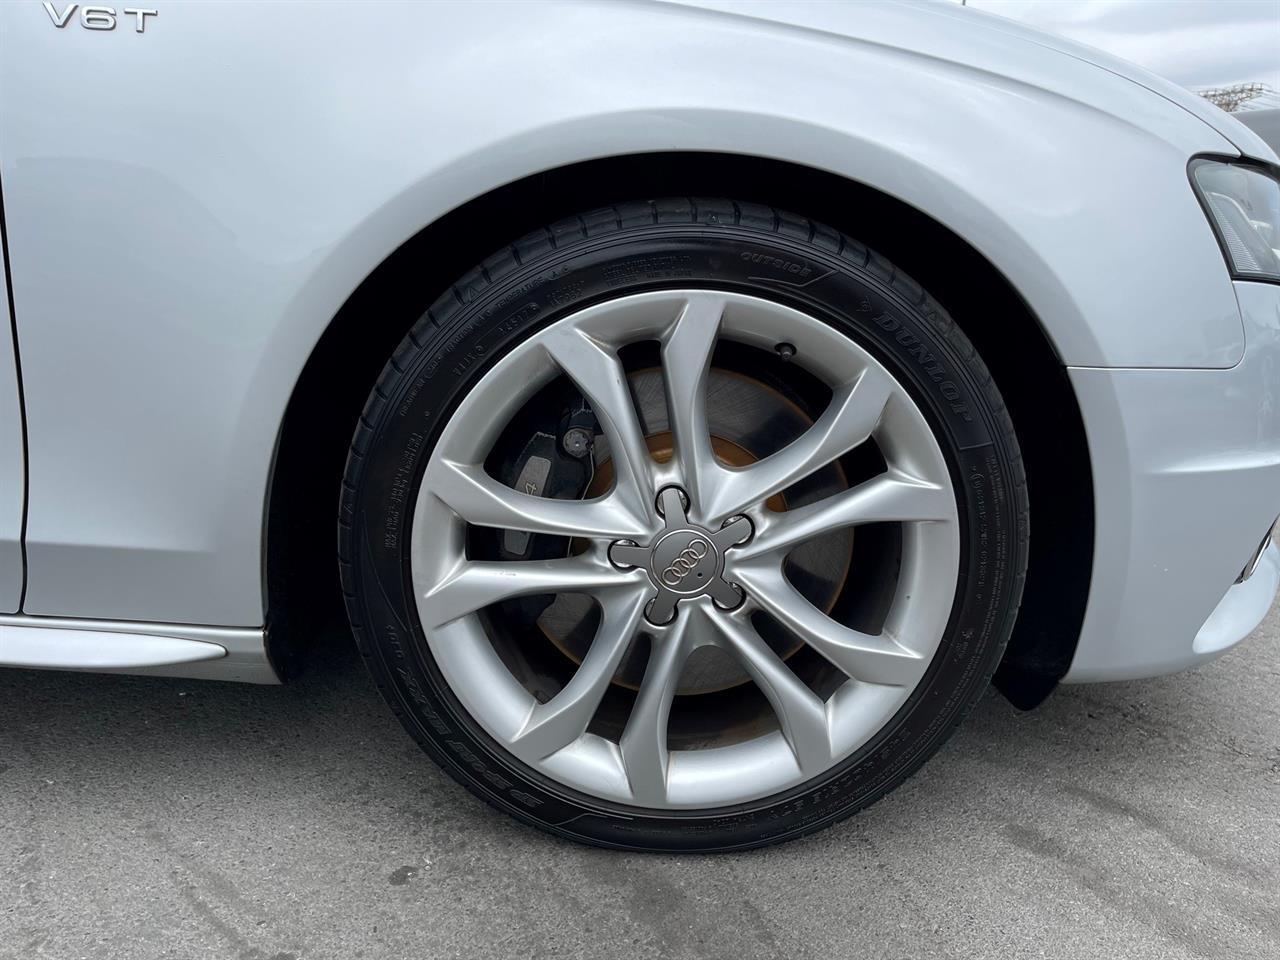 image-14, 2009 Audi S4 3.0 V6 Supercharged TFSI Quattro Wago at Christchurch